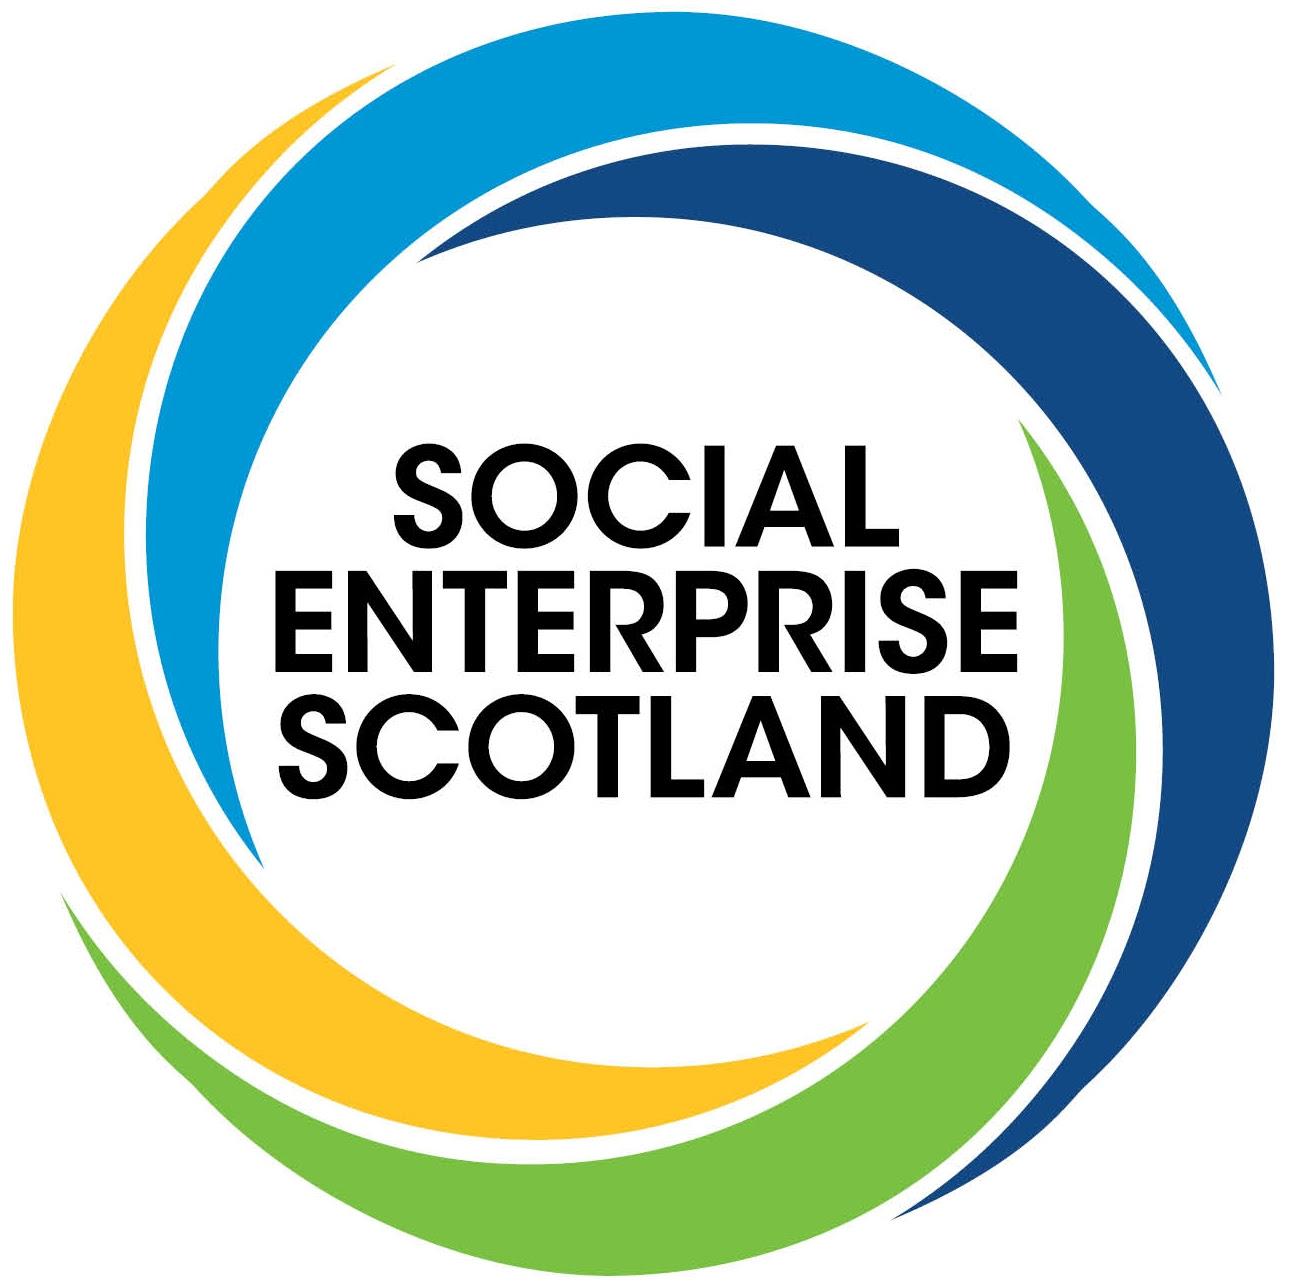 http://socialenterprisescotland.org.uk